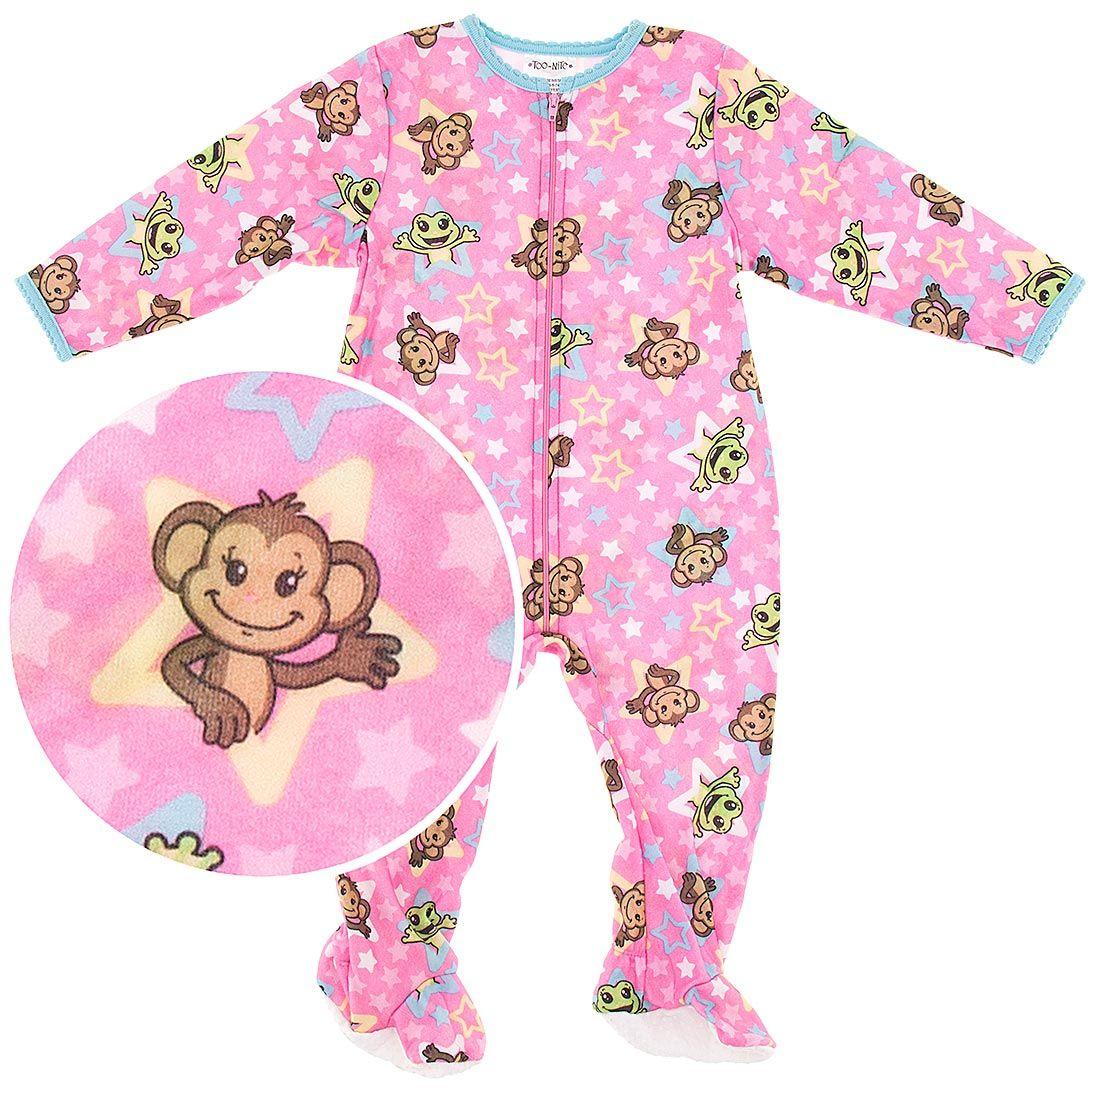 Blanket Sleepers, Footed Pajamas for Toddler Girls | Toddler girl, Footie  pajama, Pink monkeys